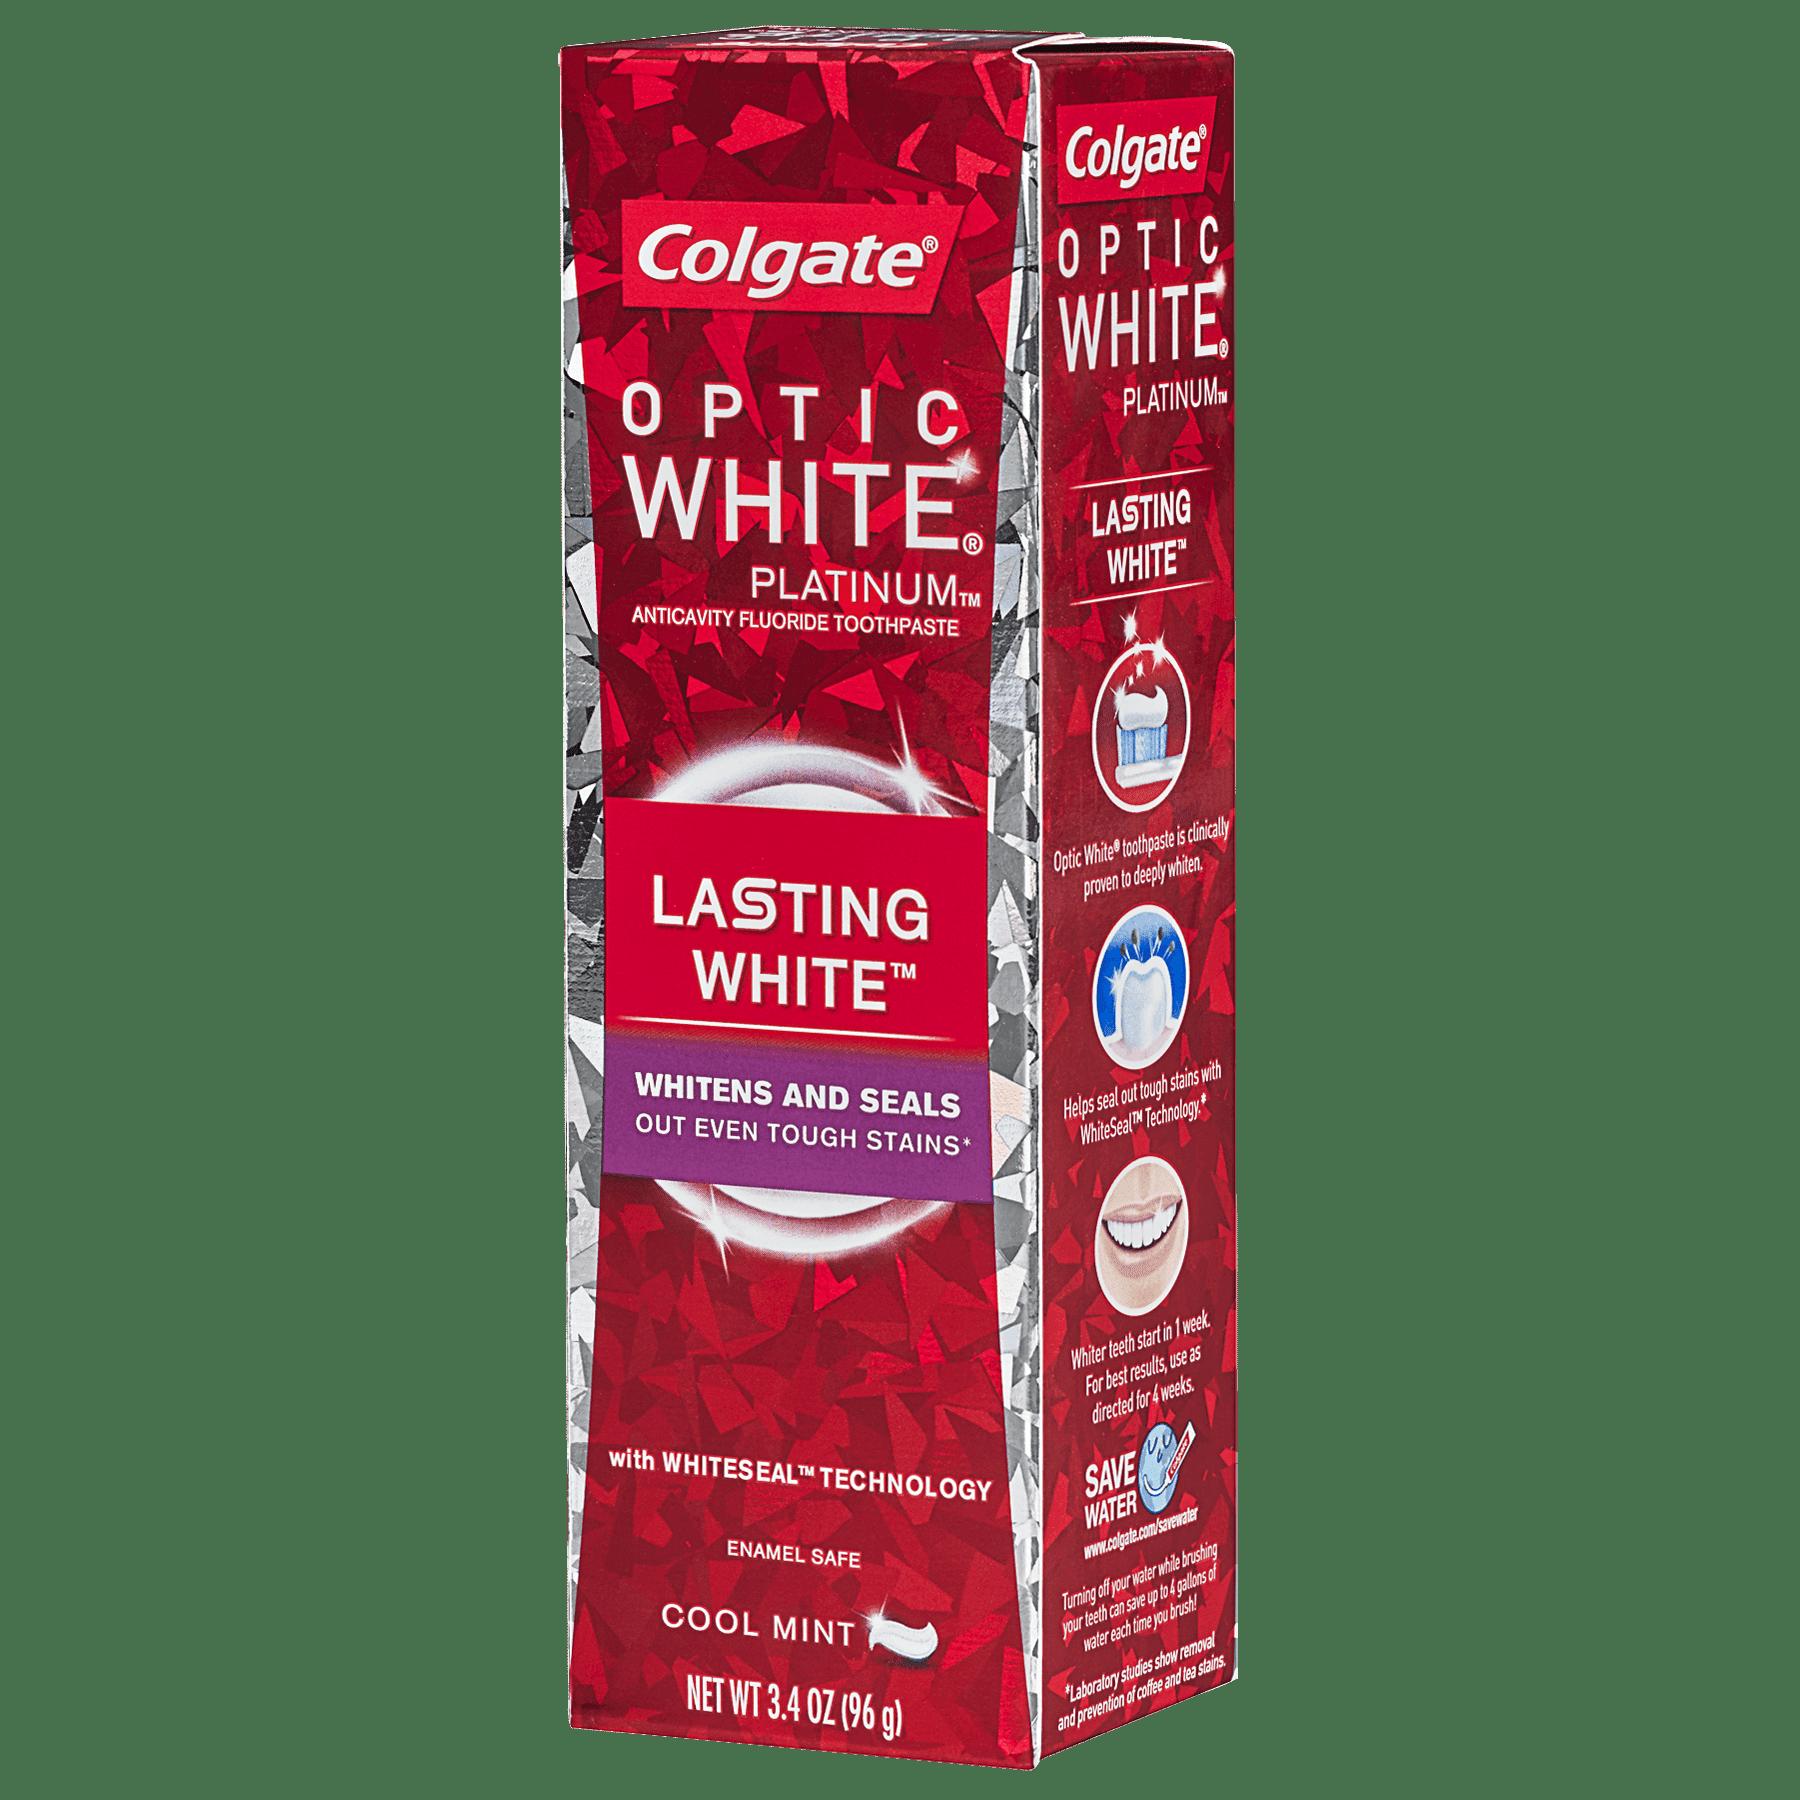 Colgate Optic White Platinum Lasting White Whitening Toothpaste - 3.4 oz